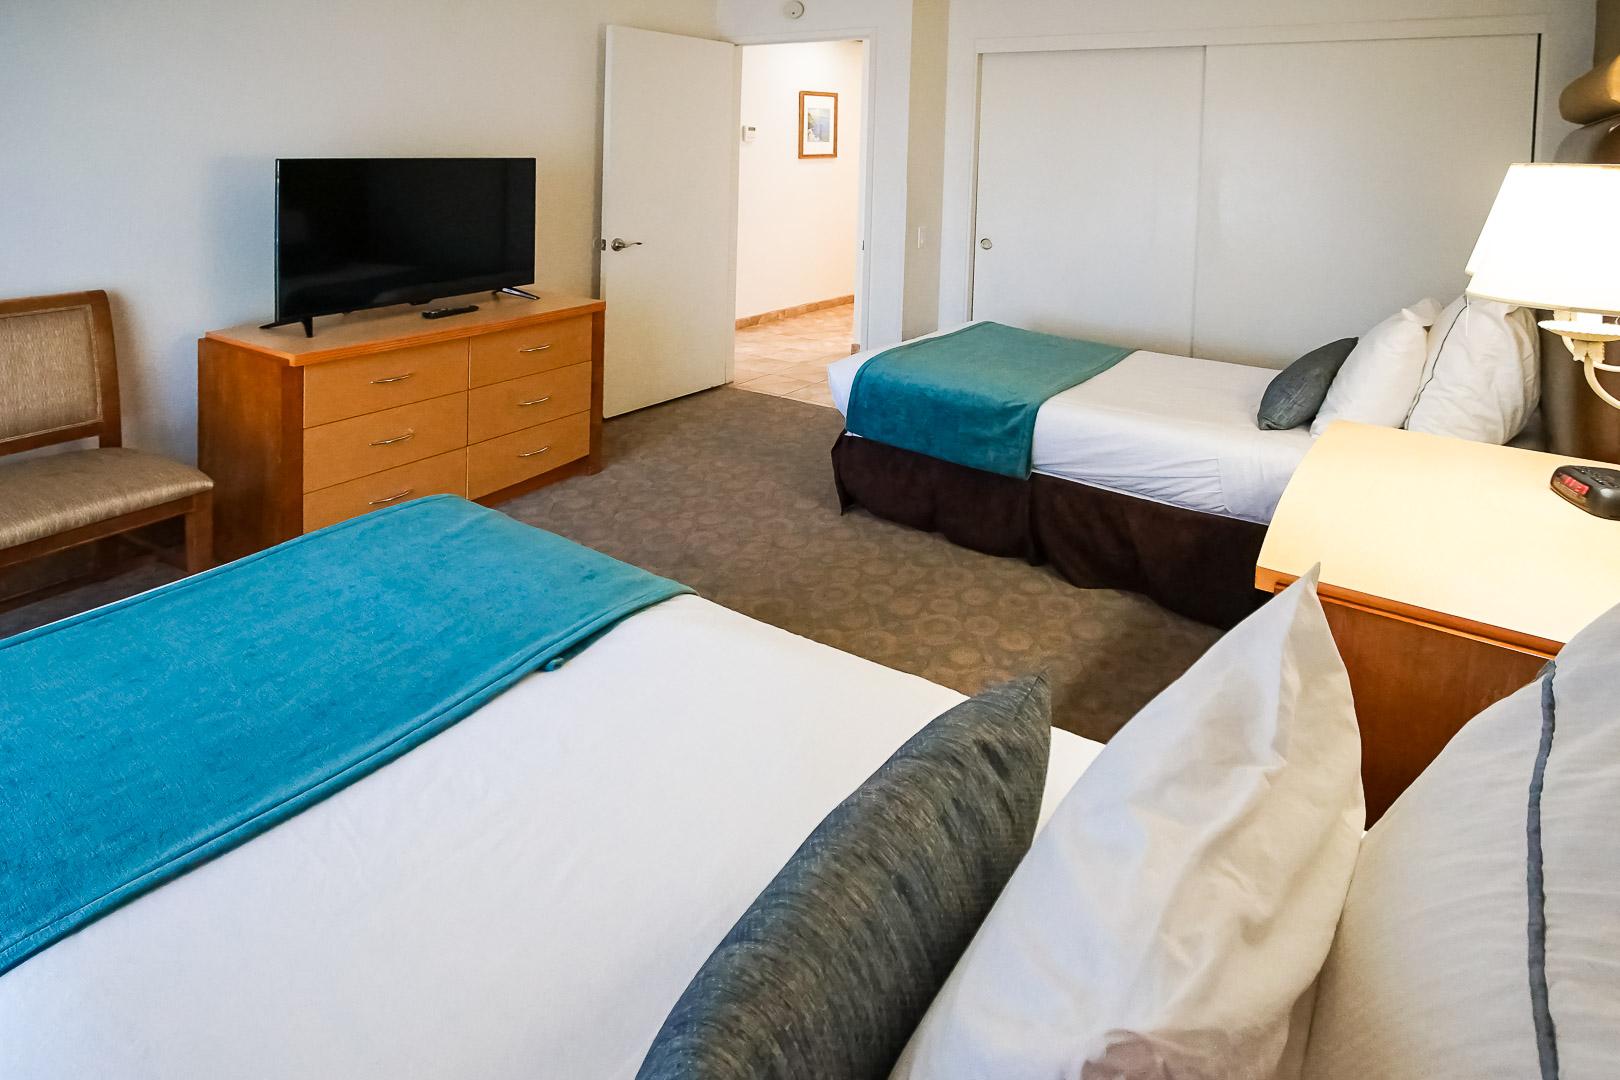 A spacious 2 bedroom unit at VRI Americas Desert Breezes Resort in California